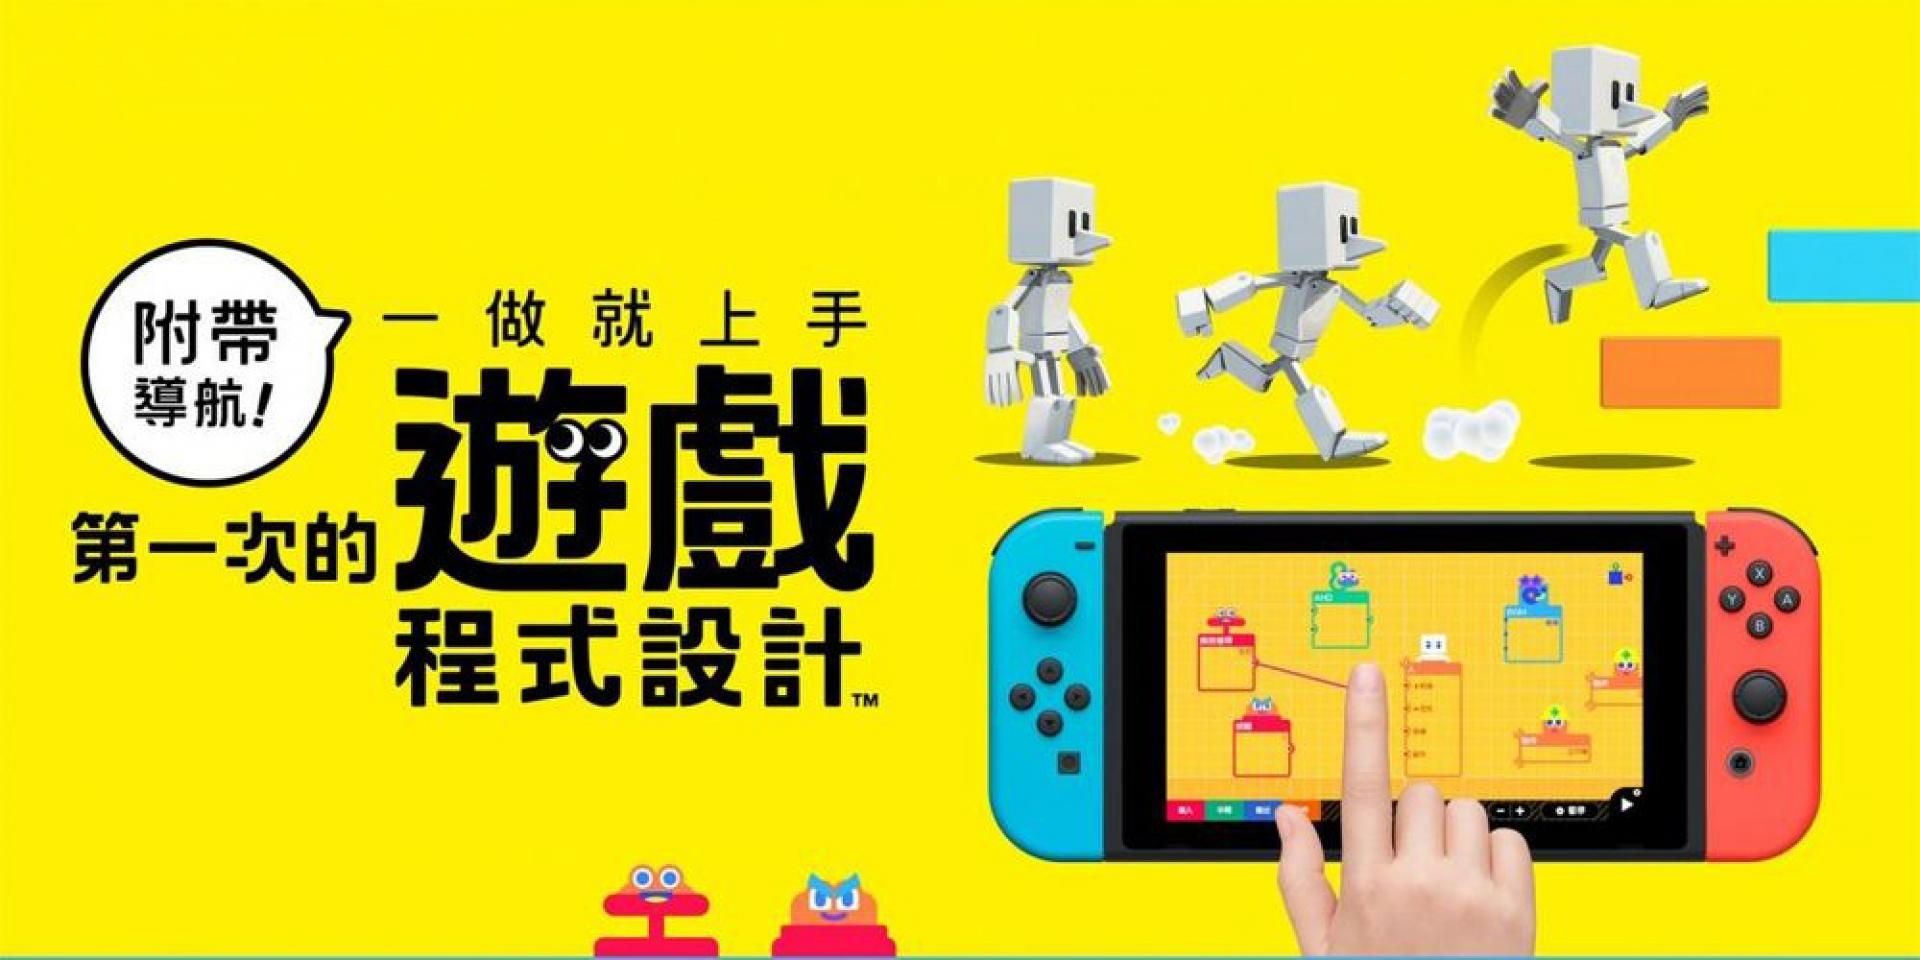 Nintendo開發室誕生的程式設計遊戲。附帶導航!一做就上手 第一次的遊戲程式設計六月問世